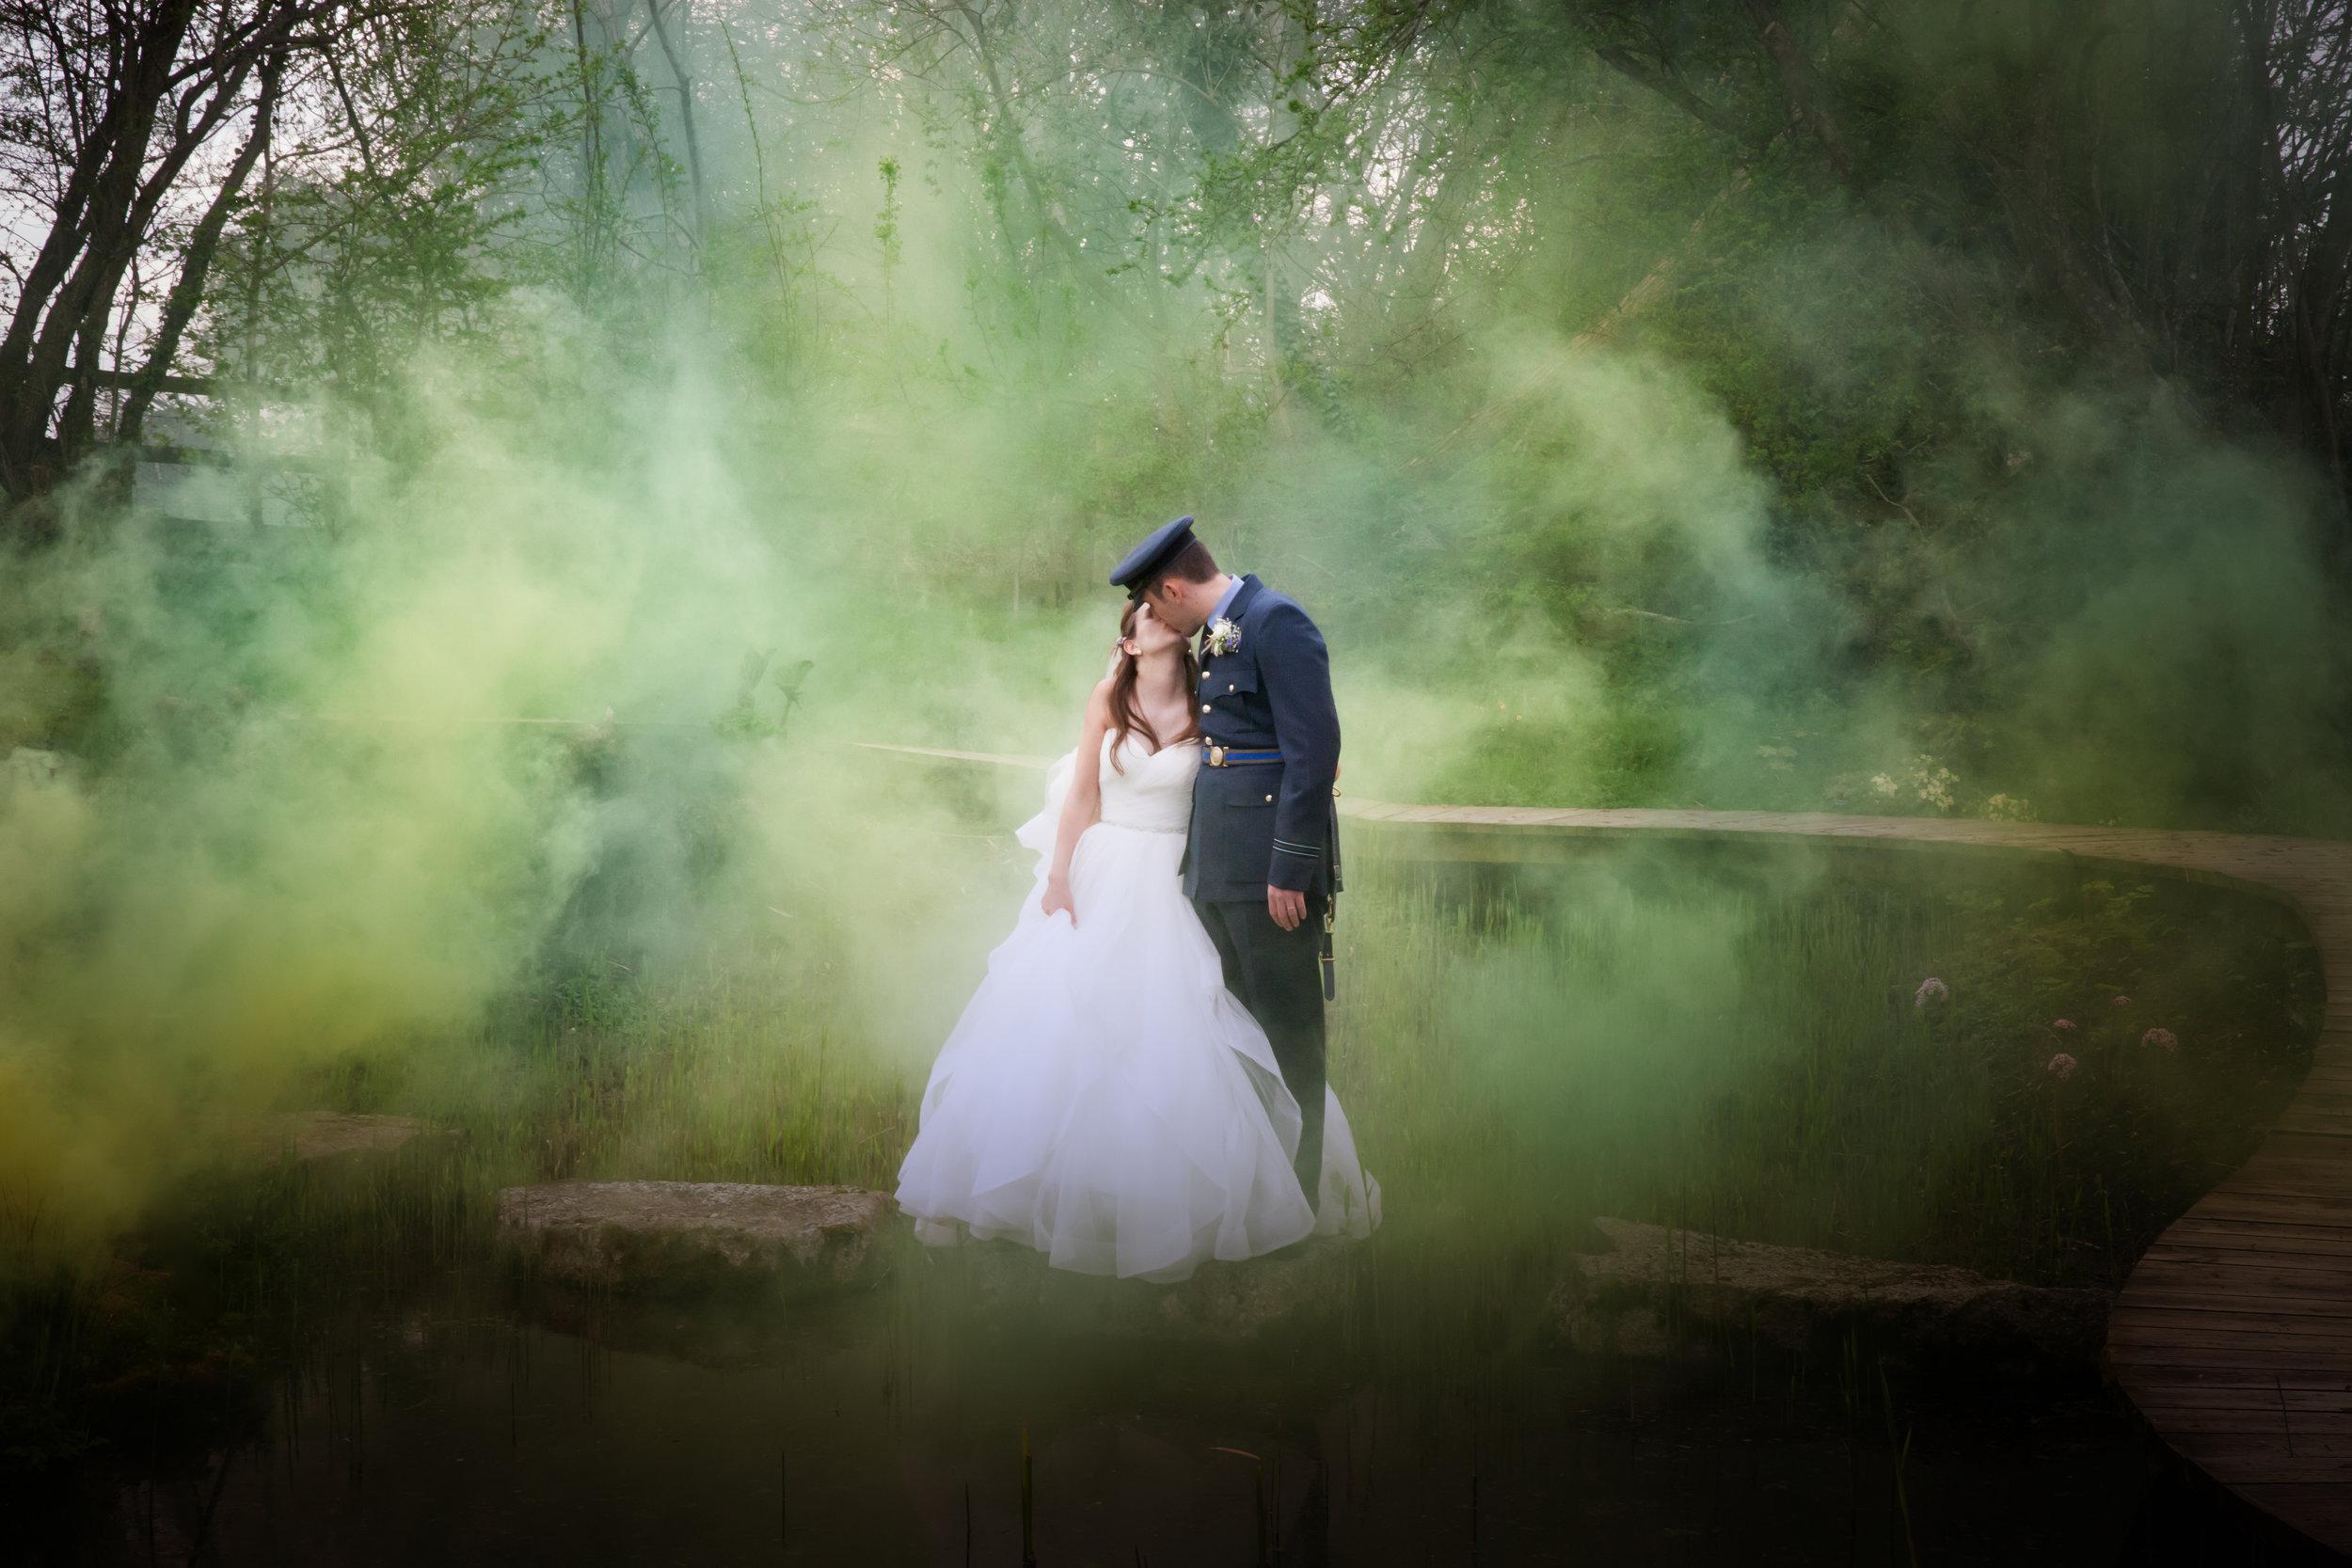 Trash or Treaure your dress shoot, Wayne Hudson Photography, Lucria Creative, Cornwall and Devon wedding photographer based in Launceston, Smoke, Water